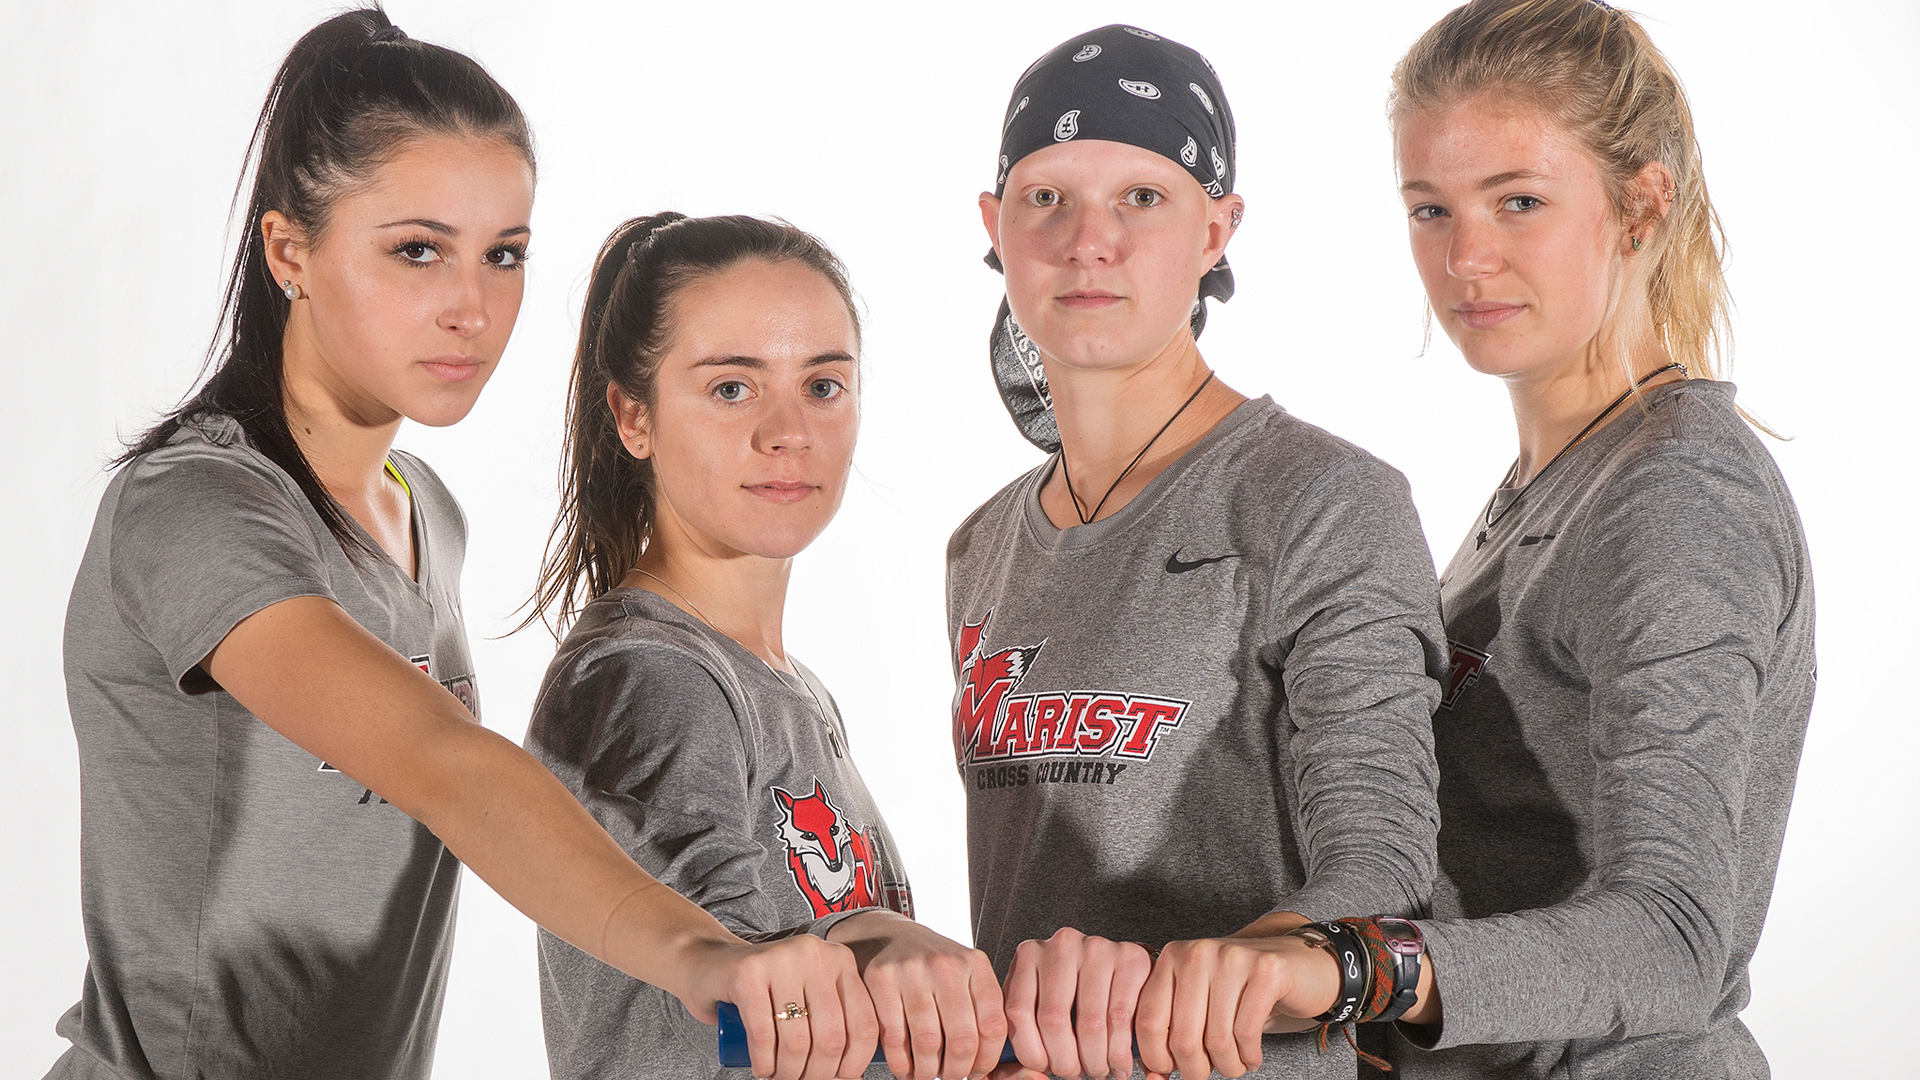 (From left to right) freshman Gianna Mastromatteo, junior Kerry Gaye, senior Jenna Robinson and sophomore Denise Grohn. Photo courtesy of Marist Athletics.